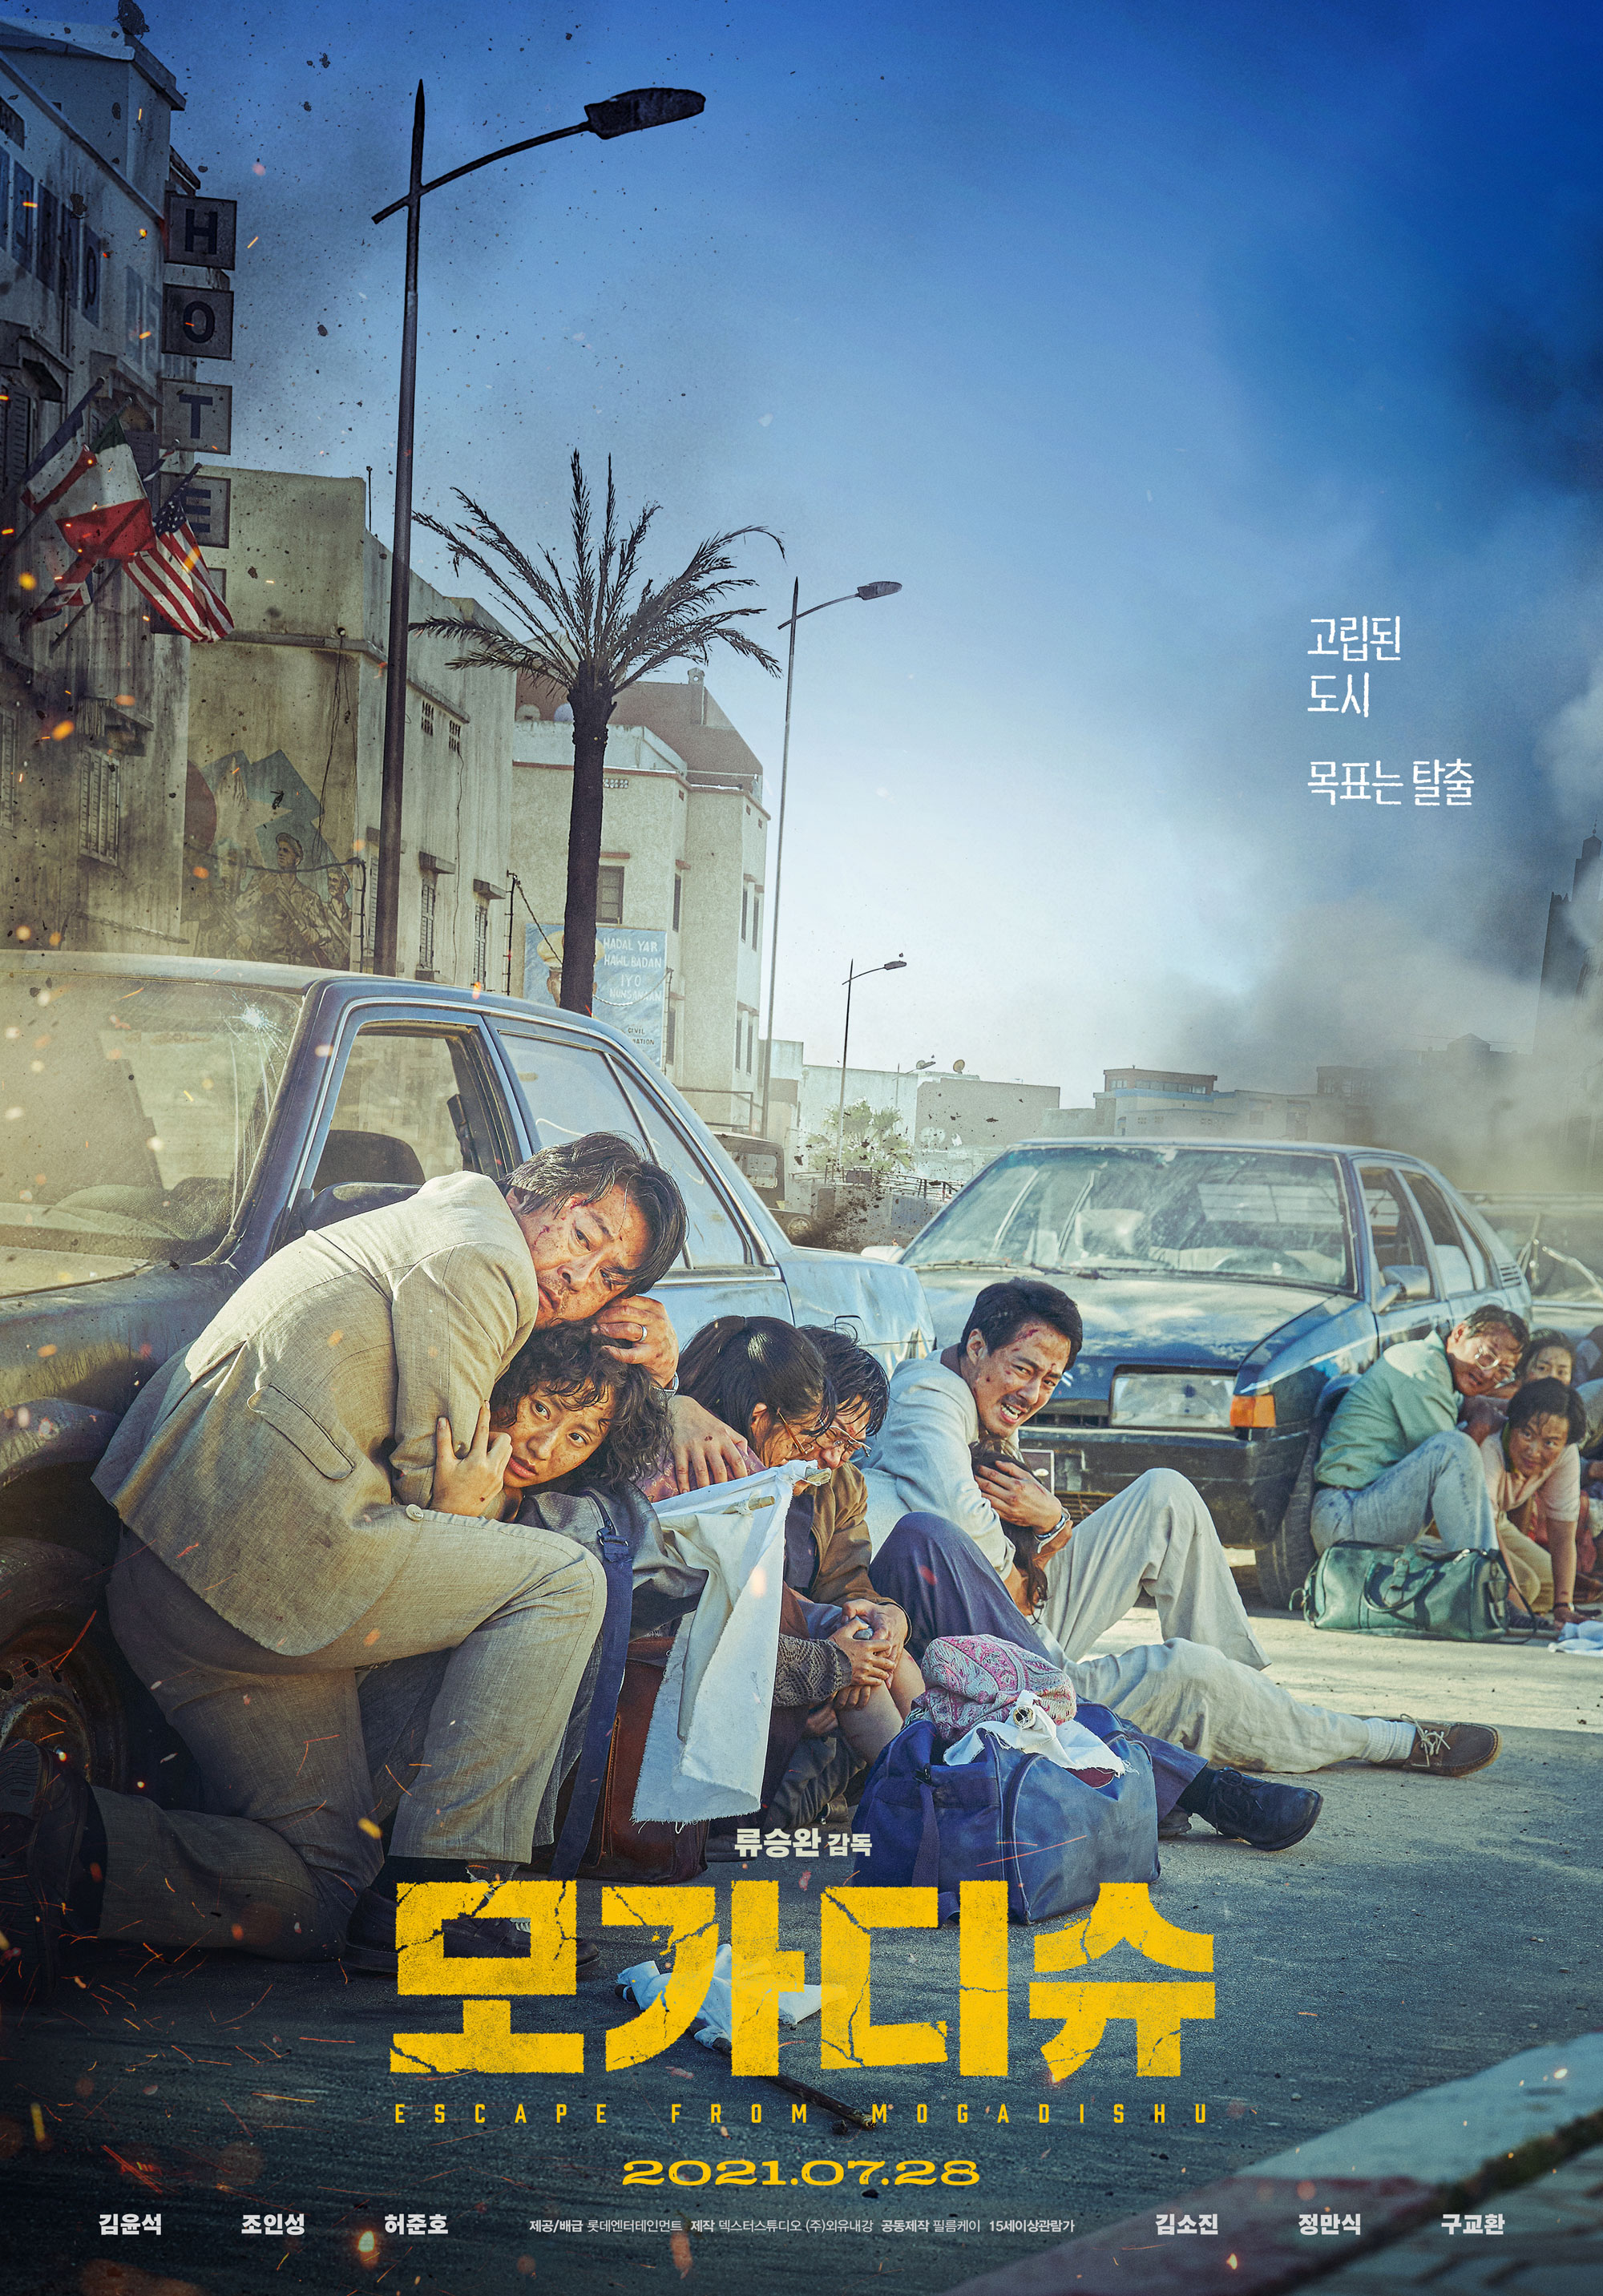 Phim Thoát khỏi Mogadishu - Escape from Mogadishu (Mogadisyu) (2021)